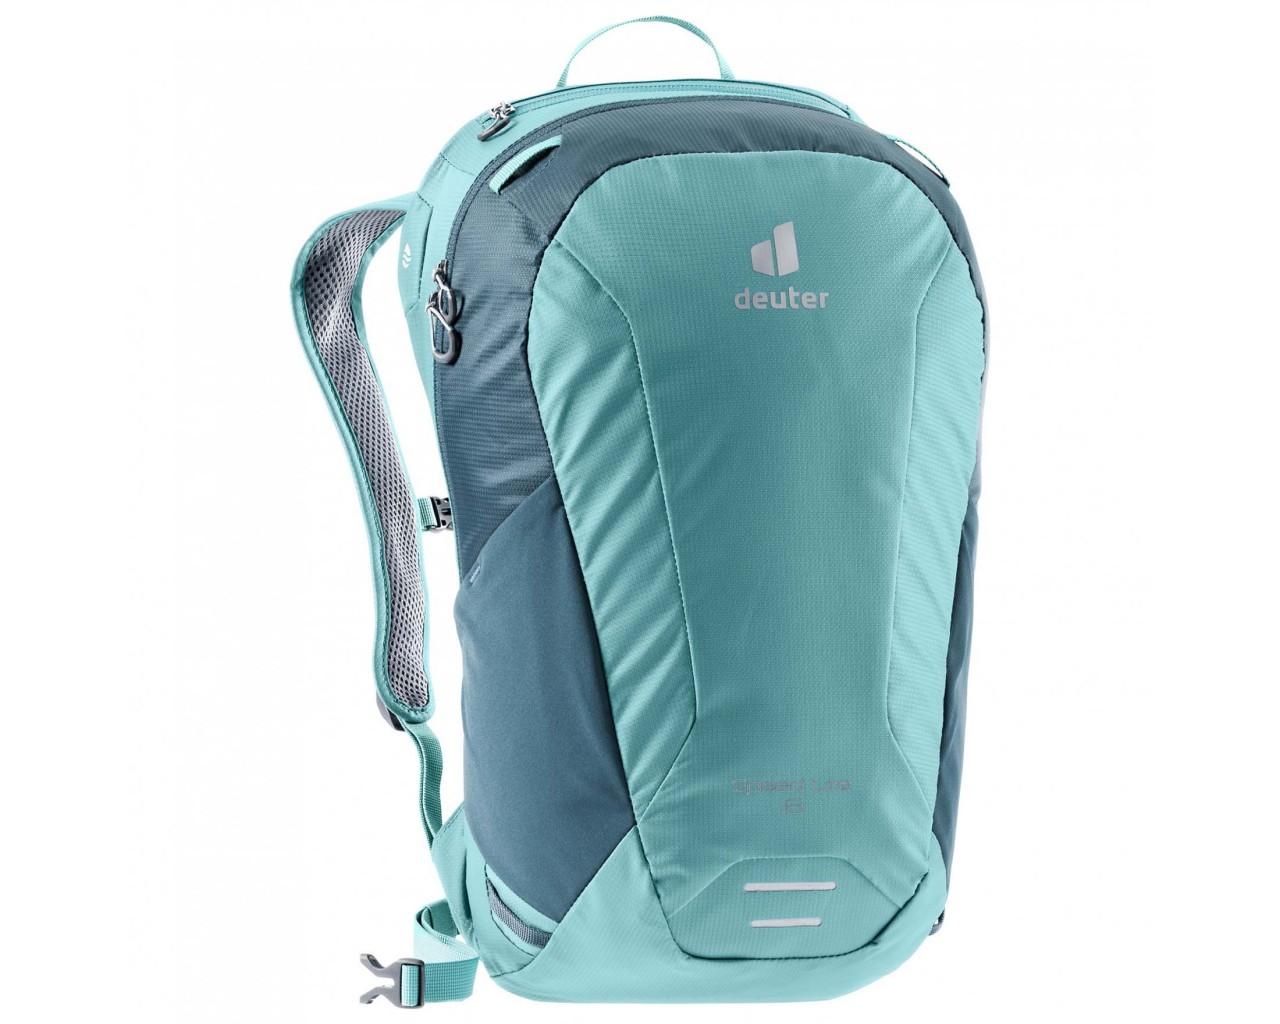 Deuter Speed Lite 16 litres backpack PFC-free   dustblue-arctic